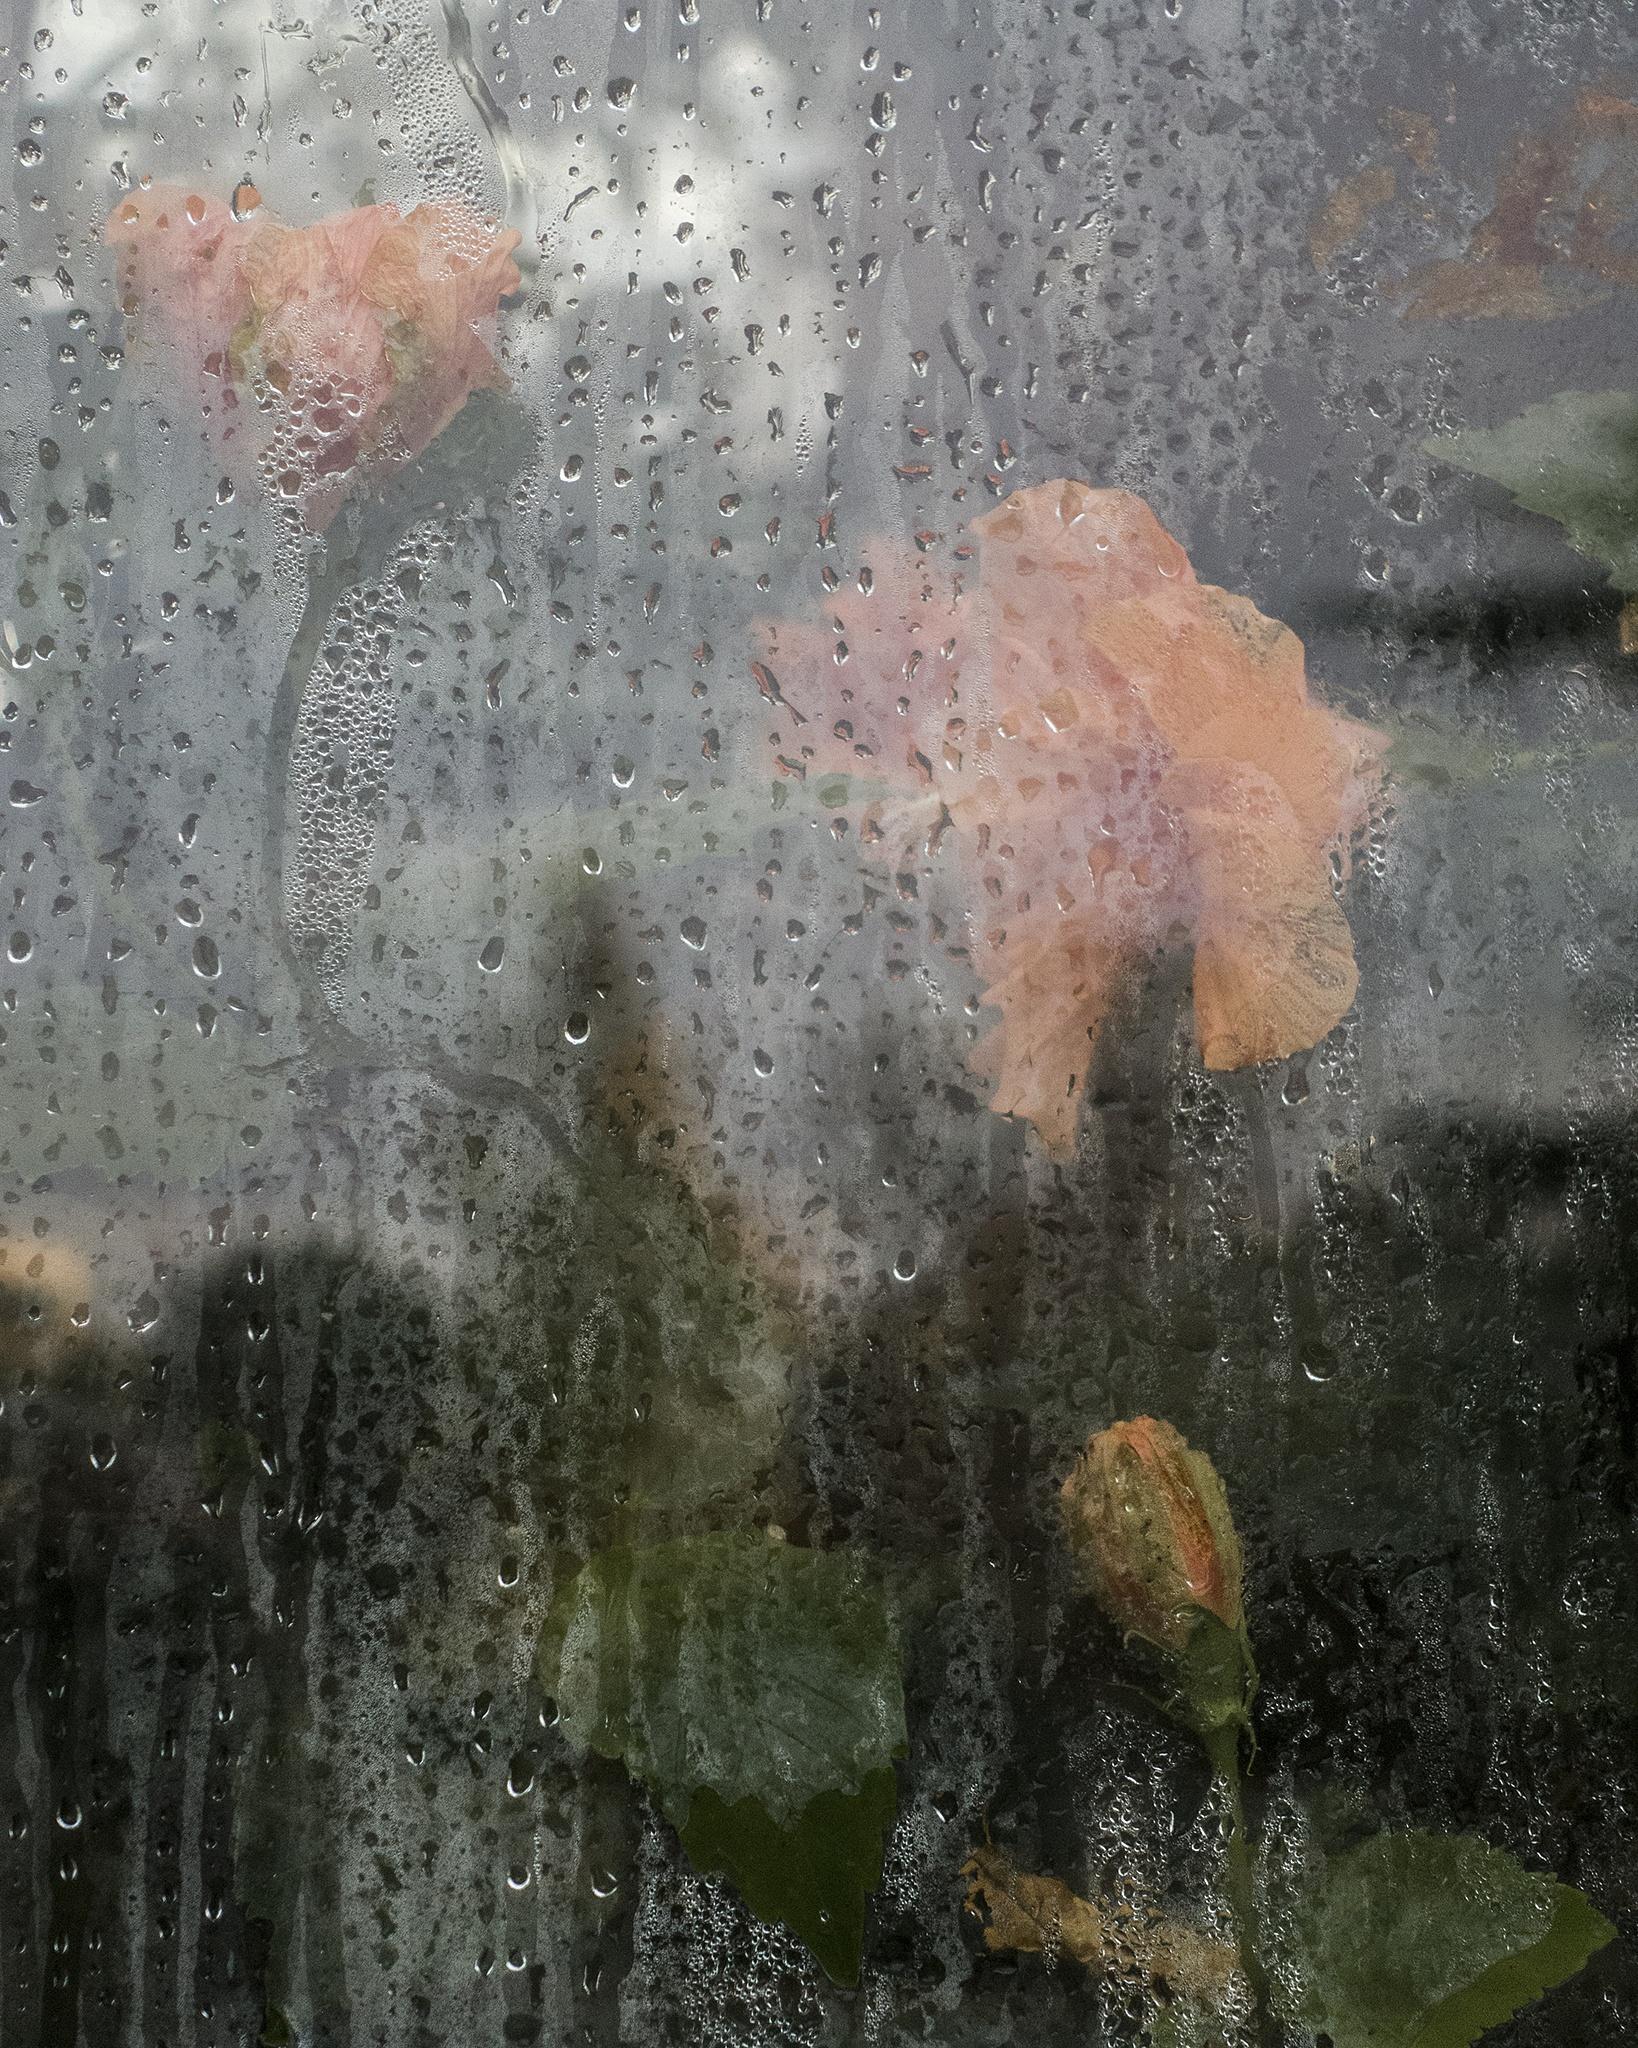 Flowers behind glass by SteveH